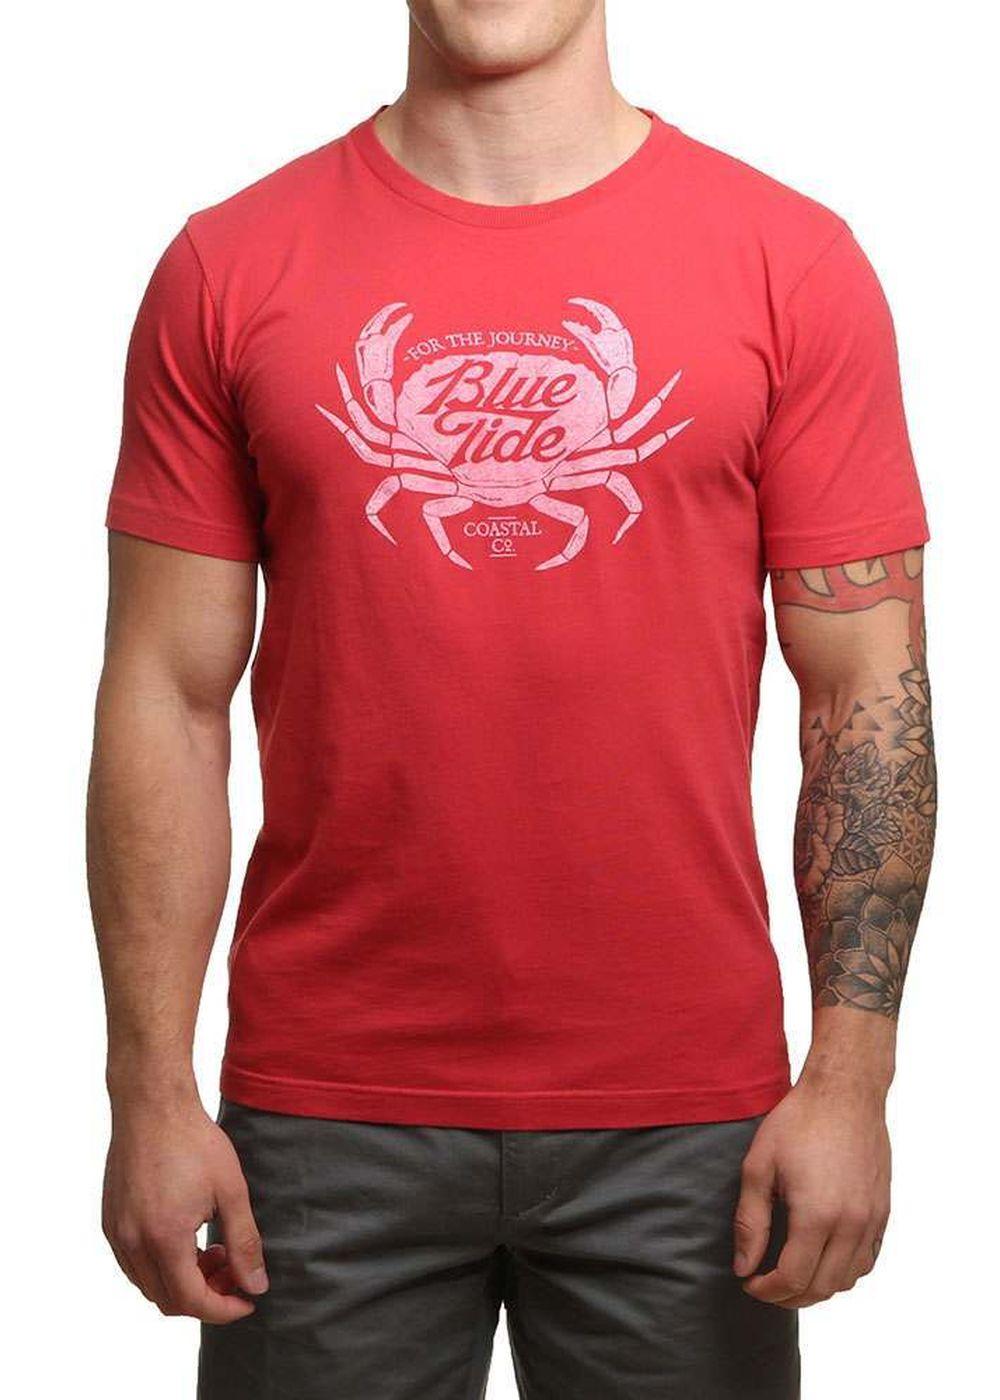 blue-tide-crab-graphic-tee-poinsettia